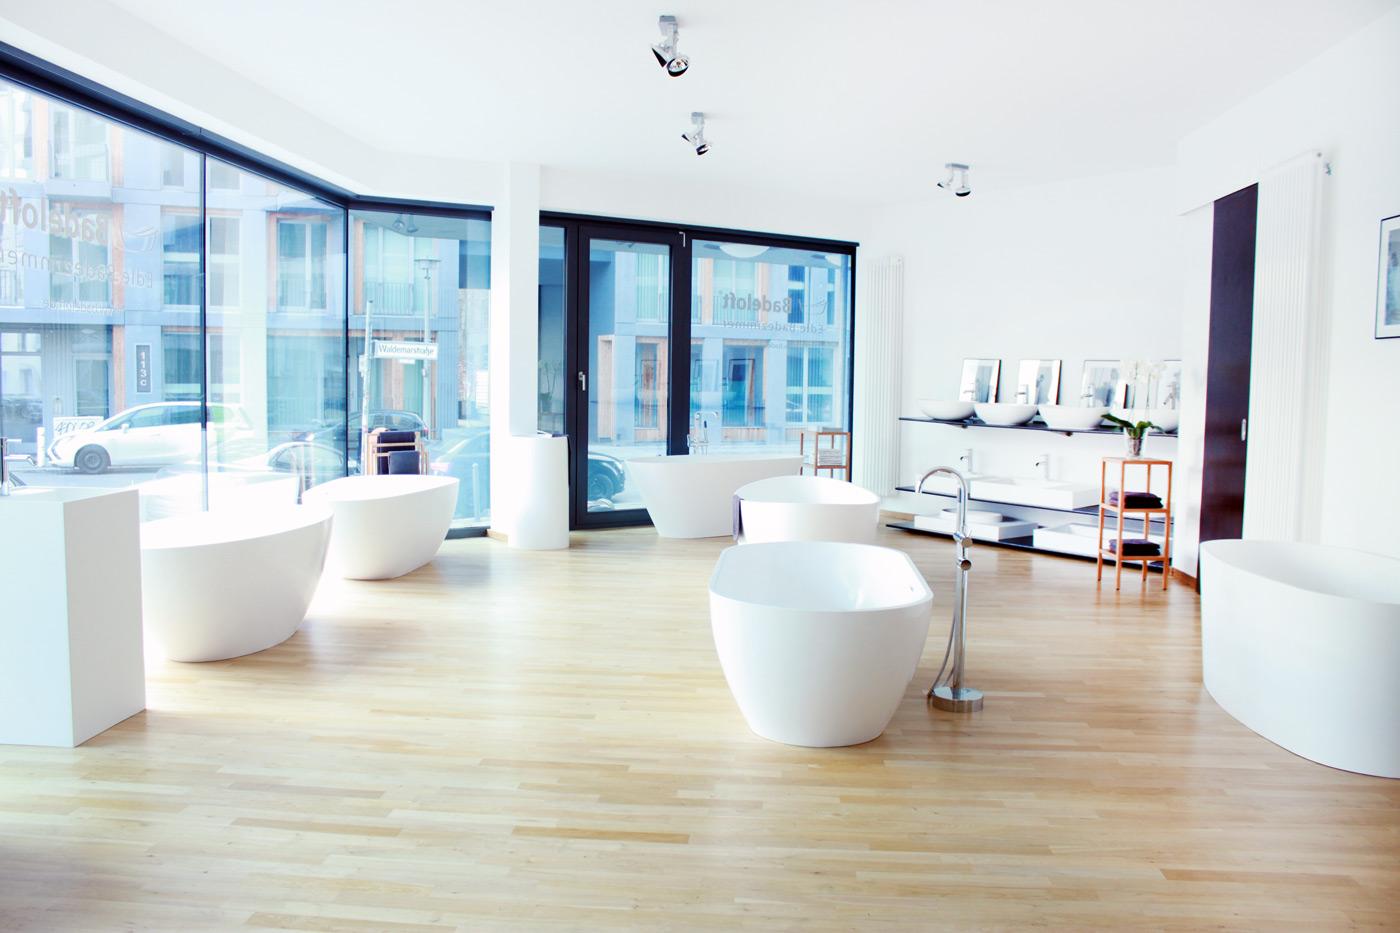 badeloft showroom berlin innenausbau verschiedenes. Black Bedroom Furniture Sets. Home Design Ideas